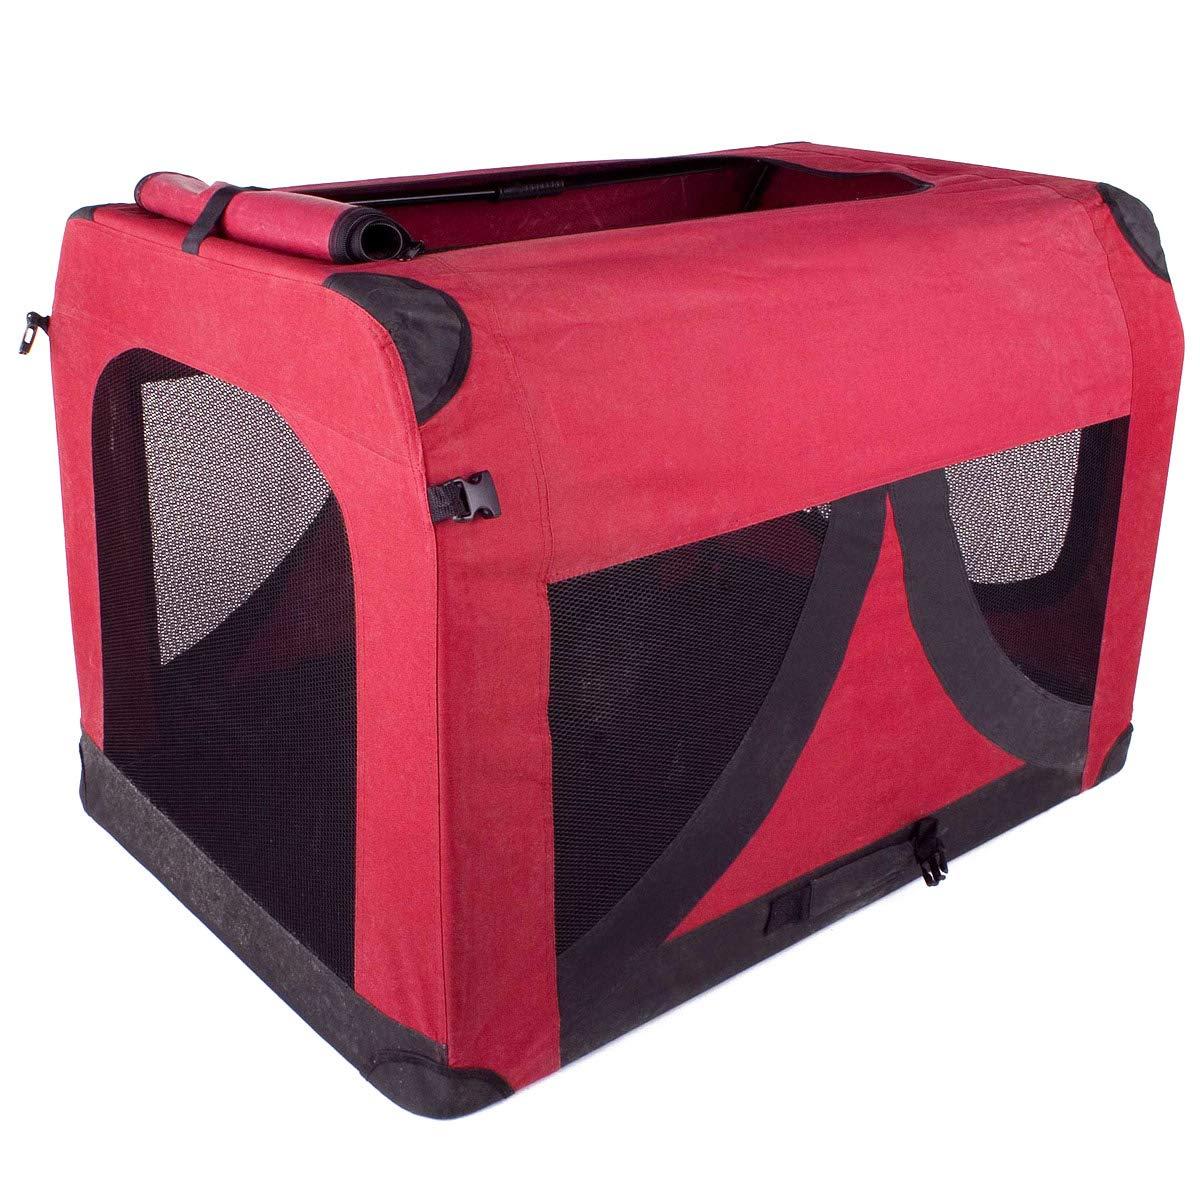 Foldable Pet Dog Cat, XXXXL Dog Transport Box